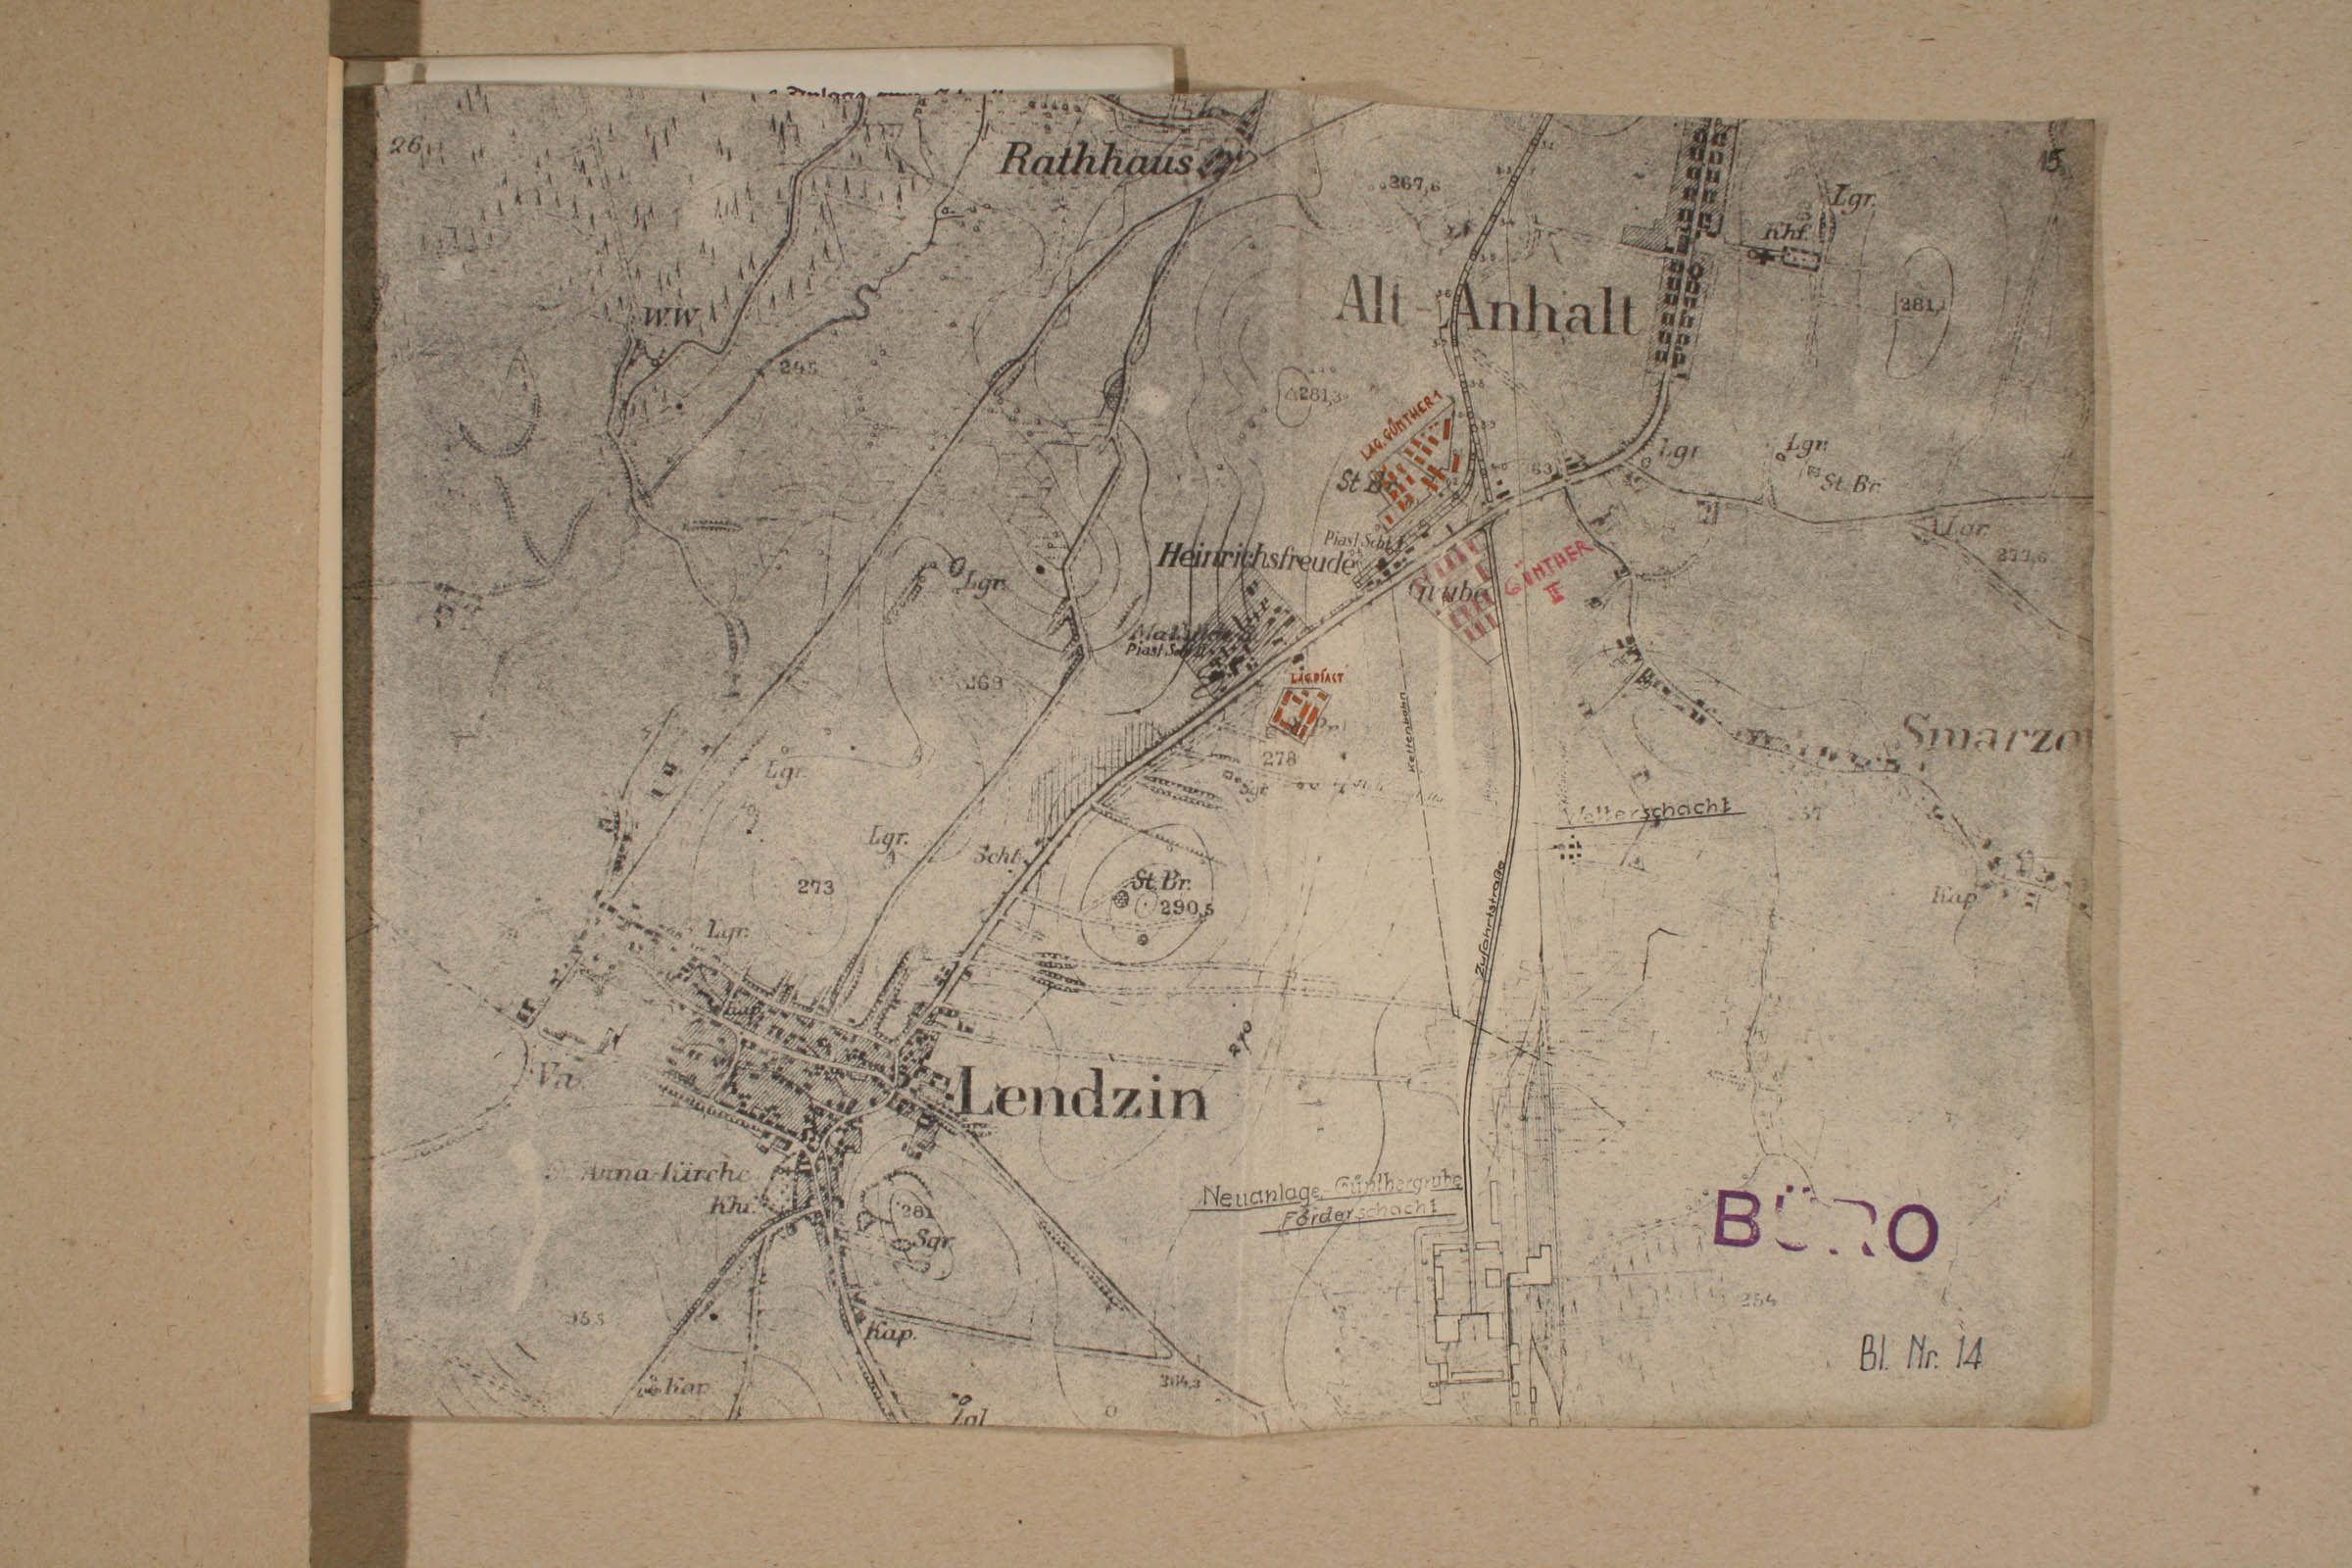 Map of camps in Ledziny. Archiwum Panstwowe w Katowicach Land Pl 12 120 708 15